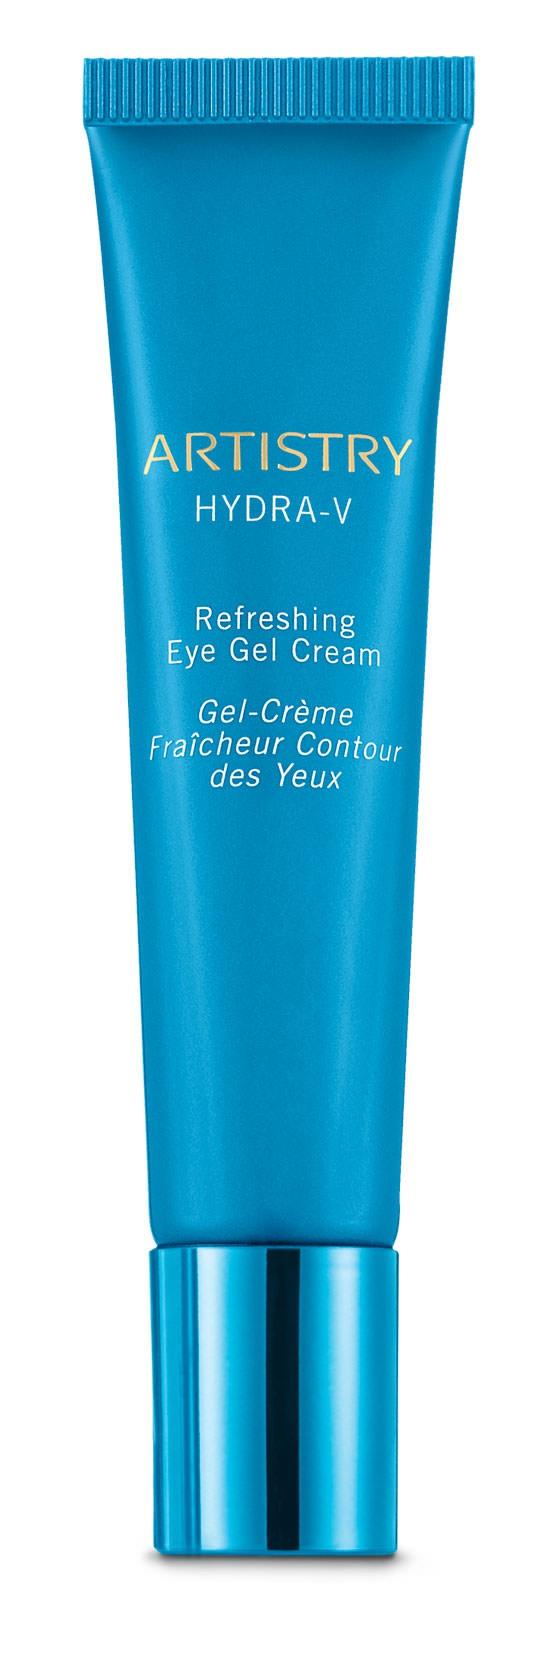 Amway Artistry Hydra - V Refreshing Eye Gel Cream